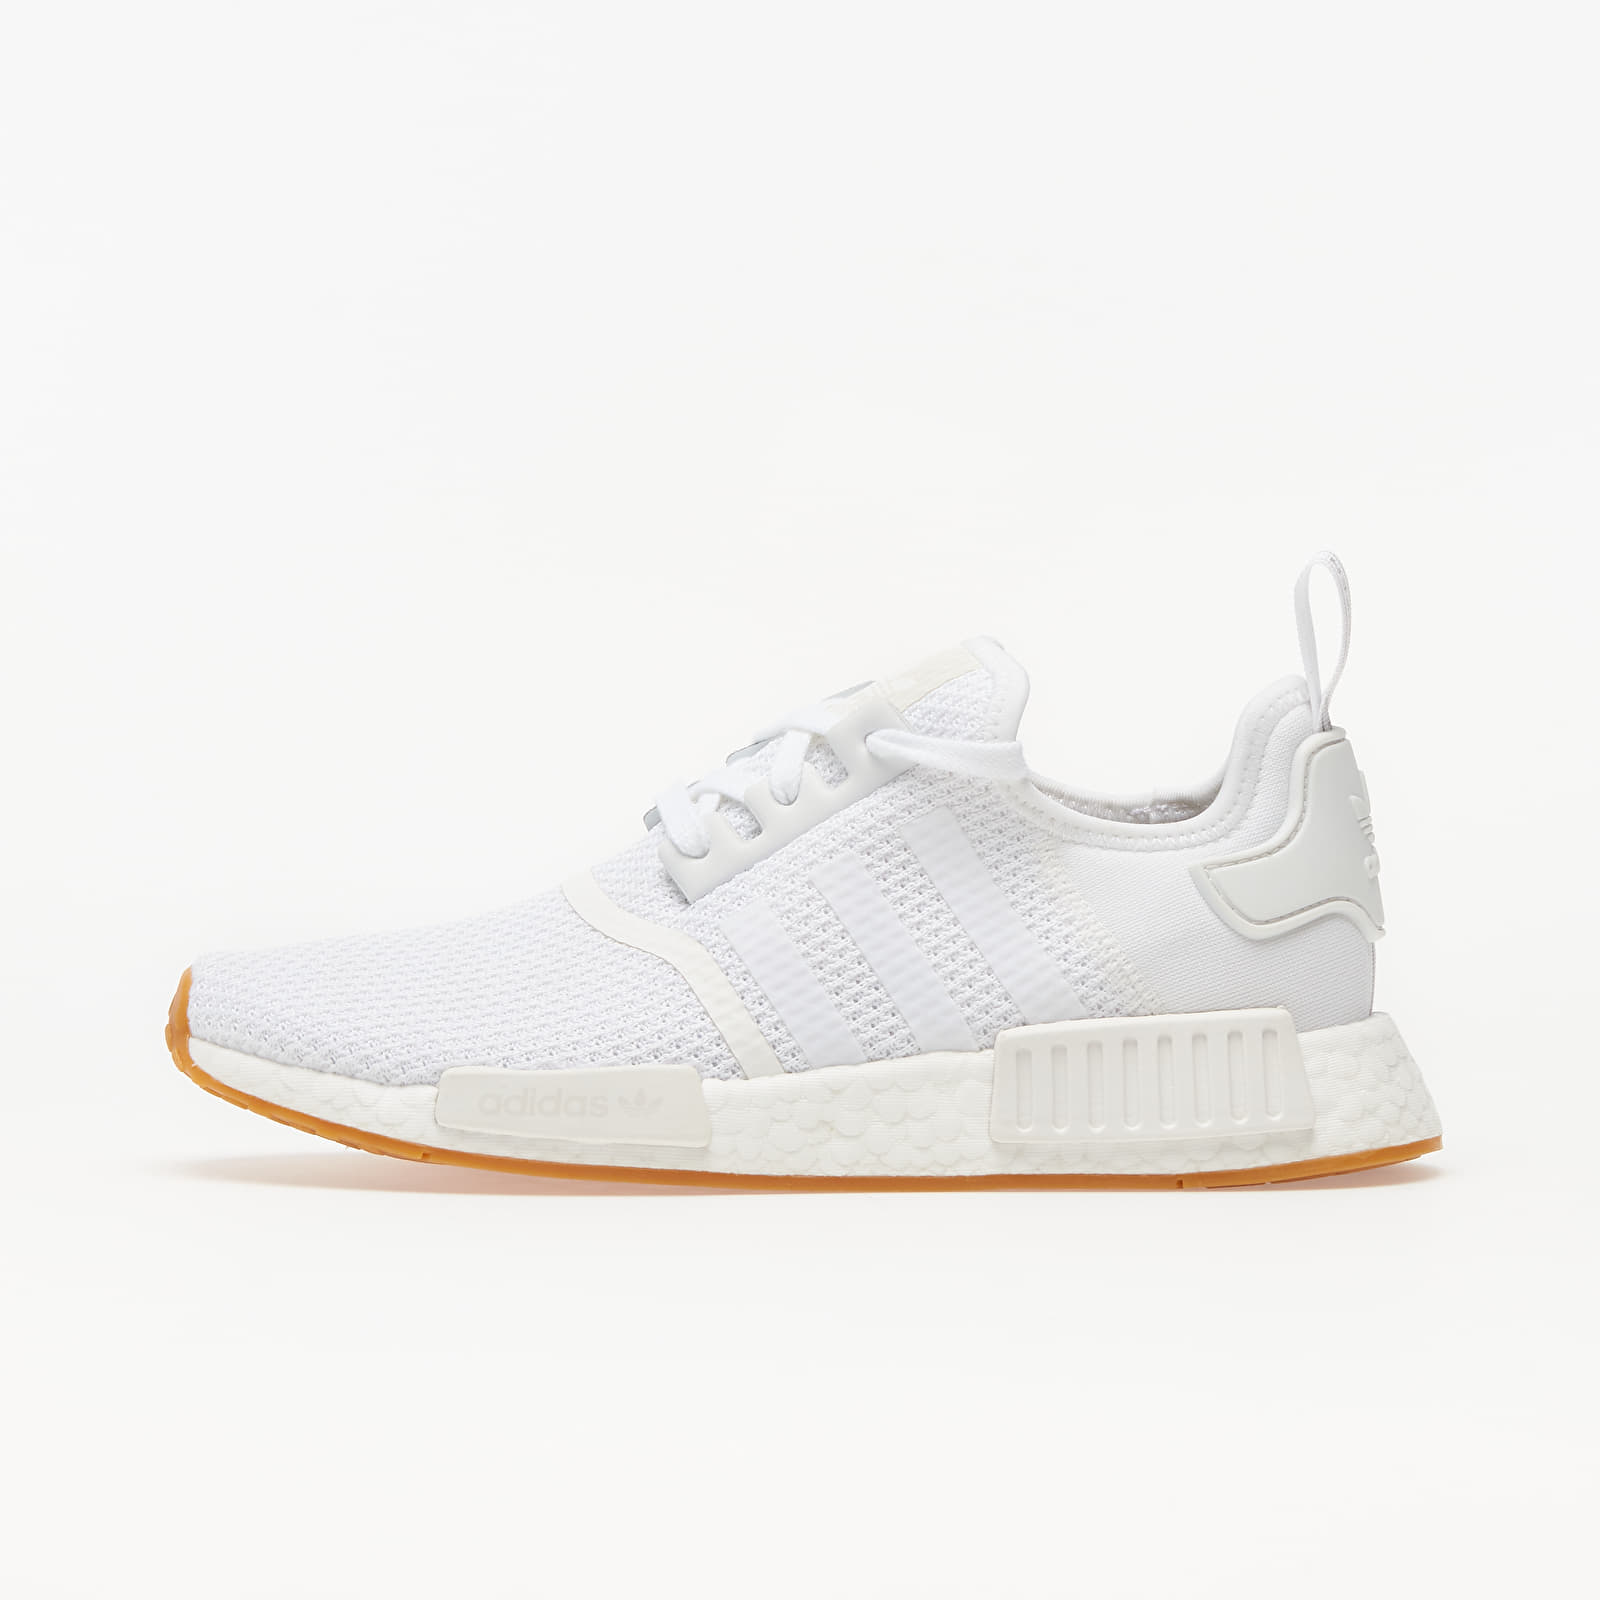 Zapatillas Hombre adidas NMD_R1 Ftw White/ Ftw White/ Gum 3